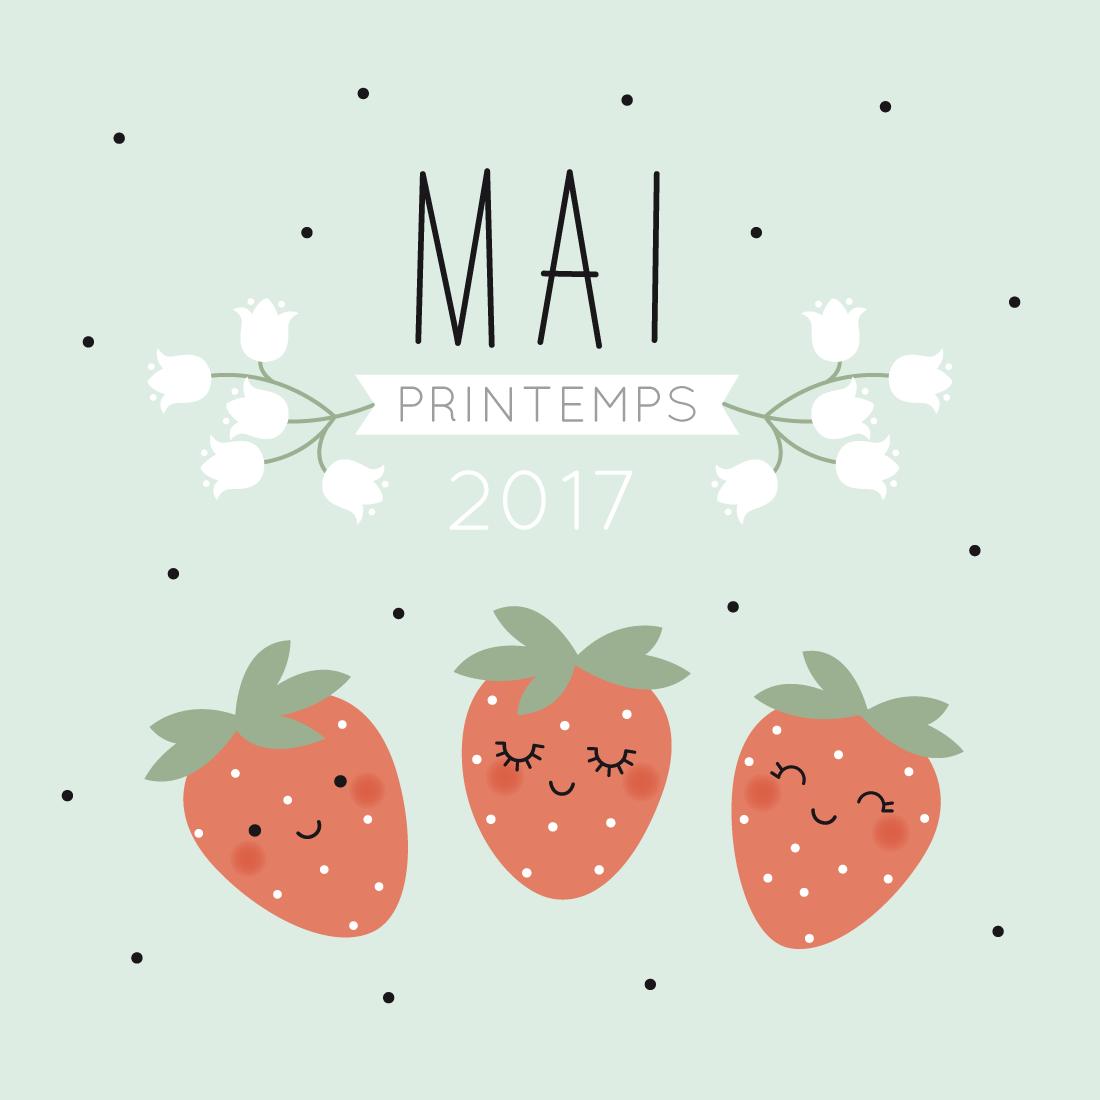 Le calendrier diy 2017 mai z le blog - Calendrier du mois de juin 2017 ...